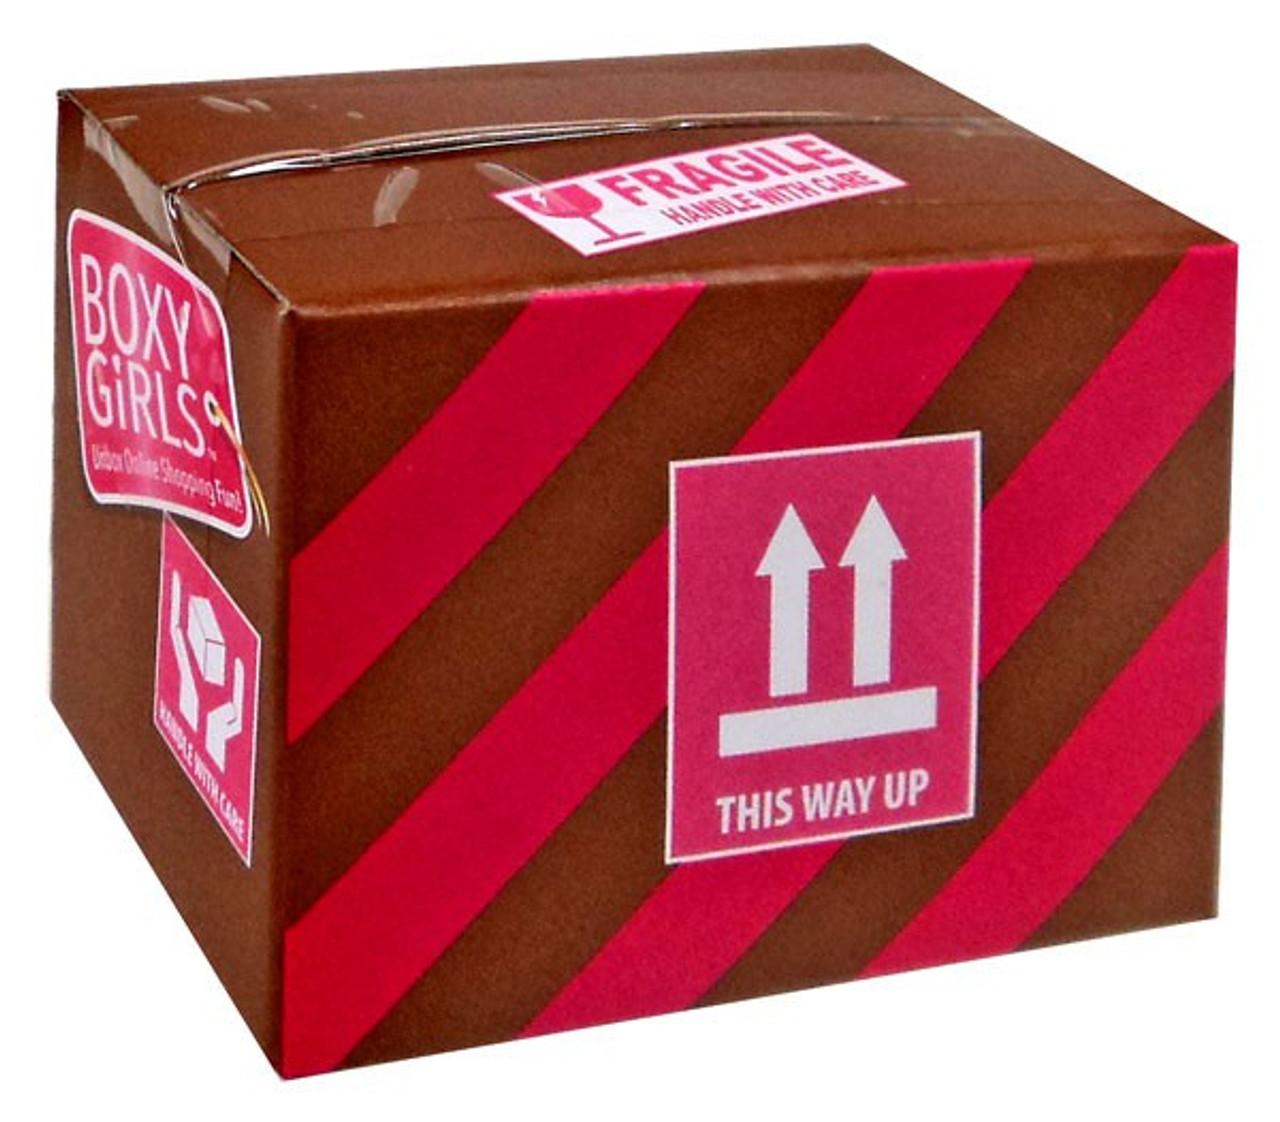 New 2019 Boxy Girls Apple Fashion Doll With Mini Mystery Shipping Box LAST ONE